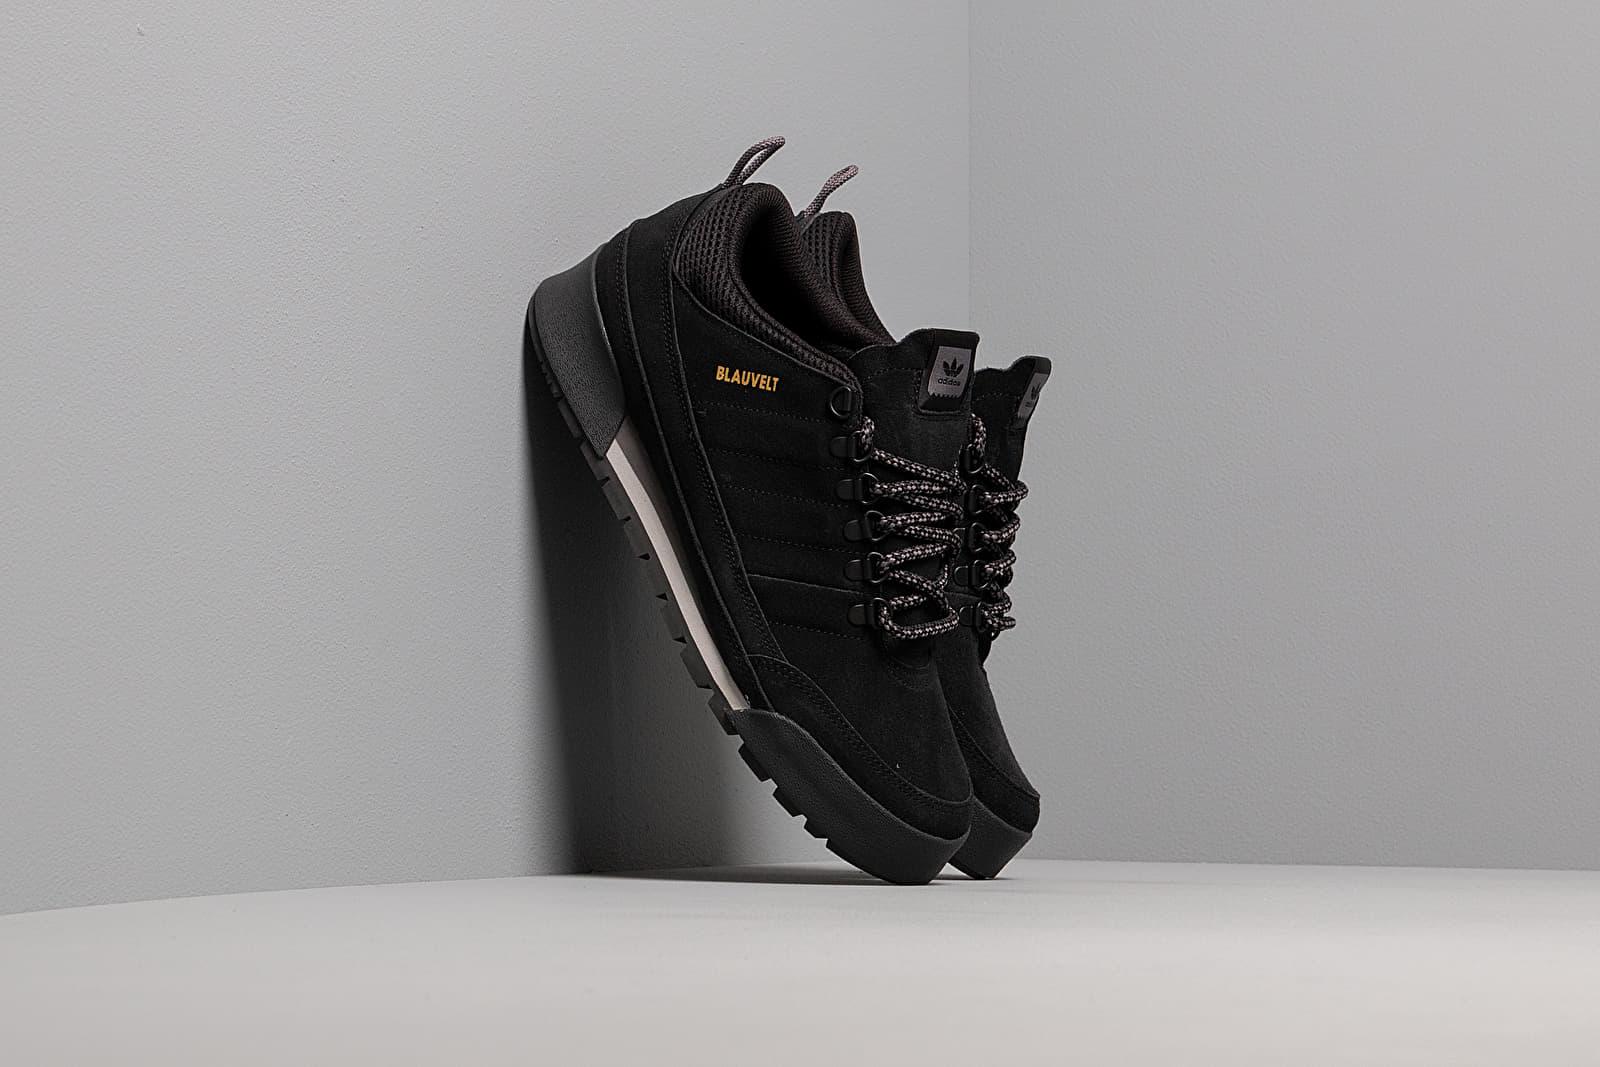 Black Grey Low FiveFootshop Core Carbon 0 Boot 2 adidas Jake cq4jL35AR